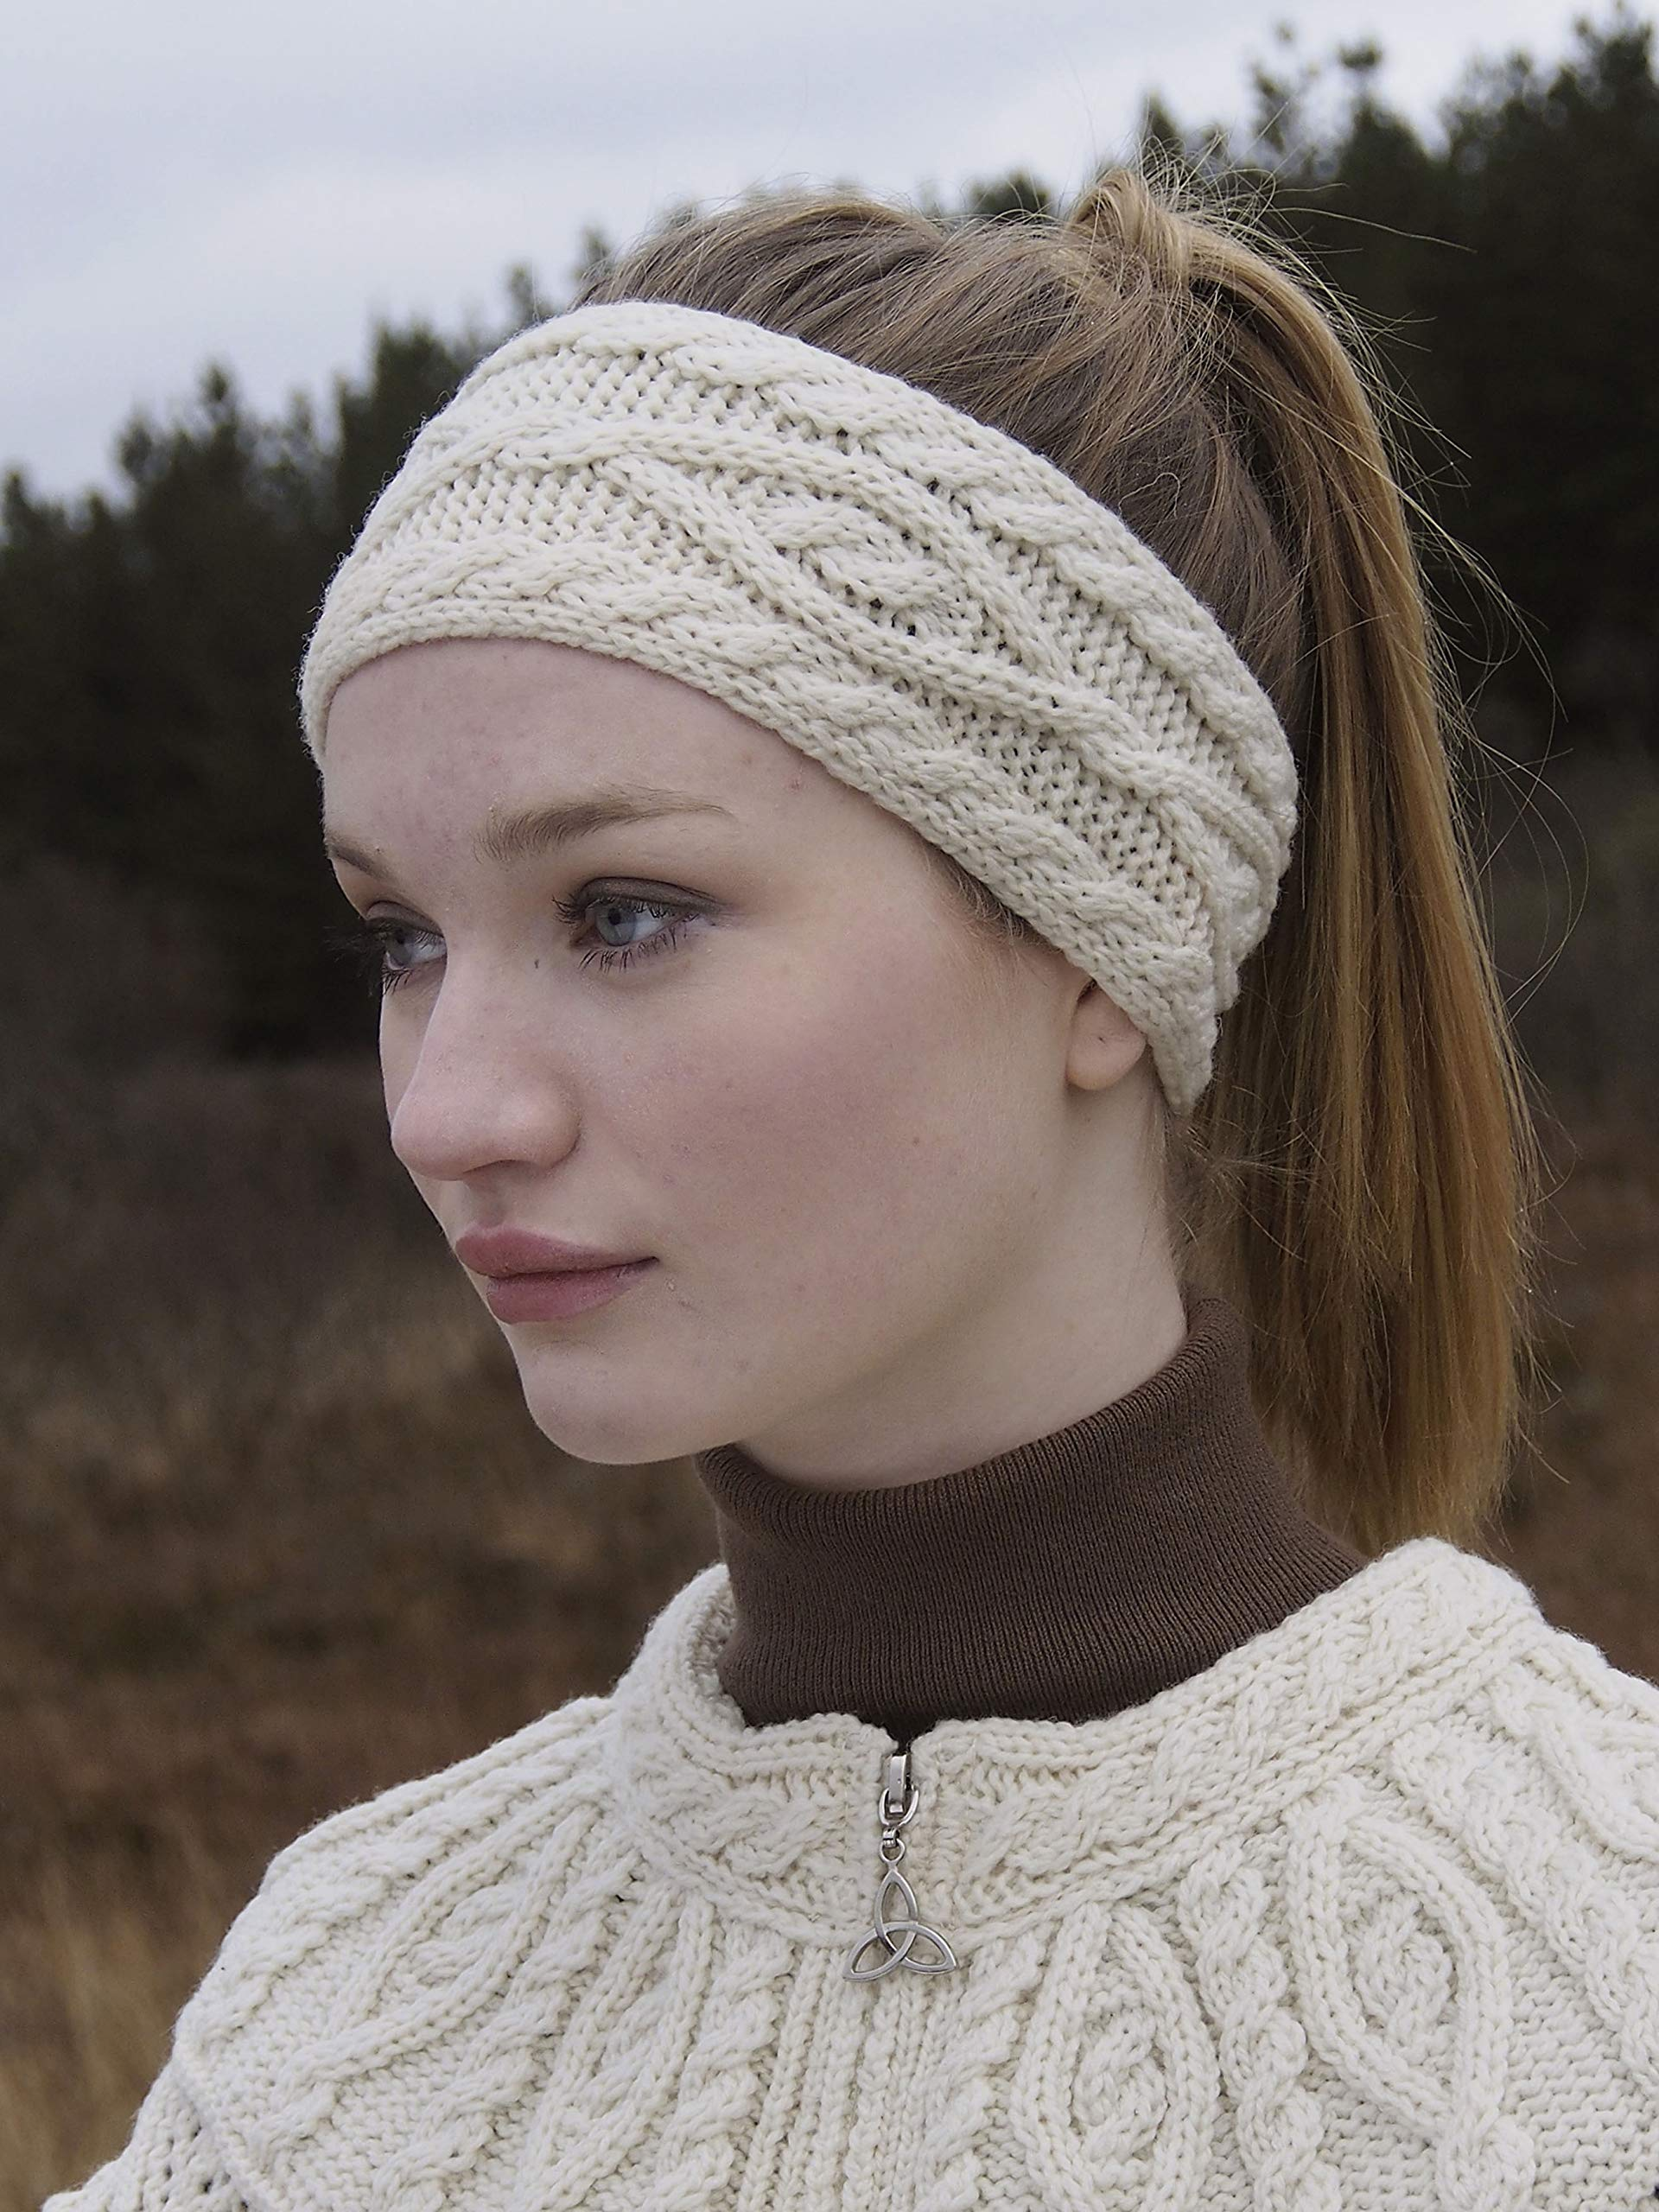 Aran Crafts Headband (100% Merino Wool) One Size Natural (X4341-NAT) by Aran Crafts Ireland (Image #4)